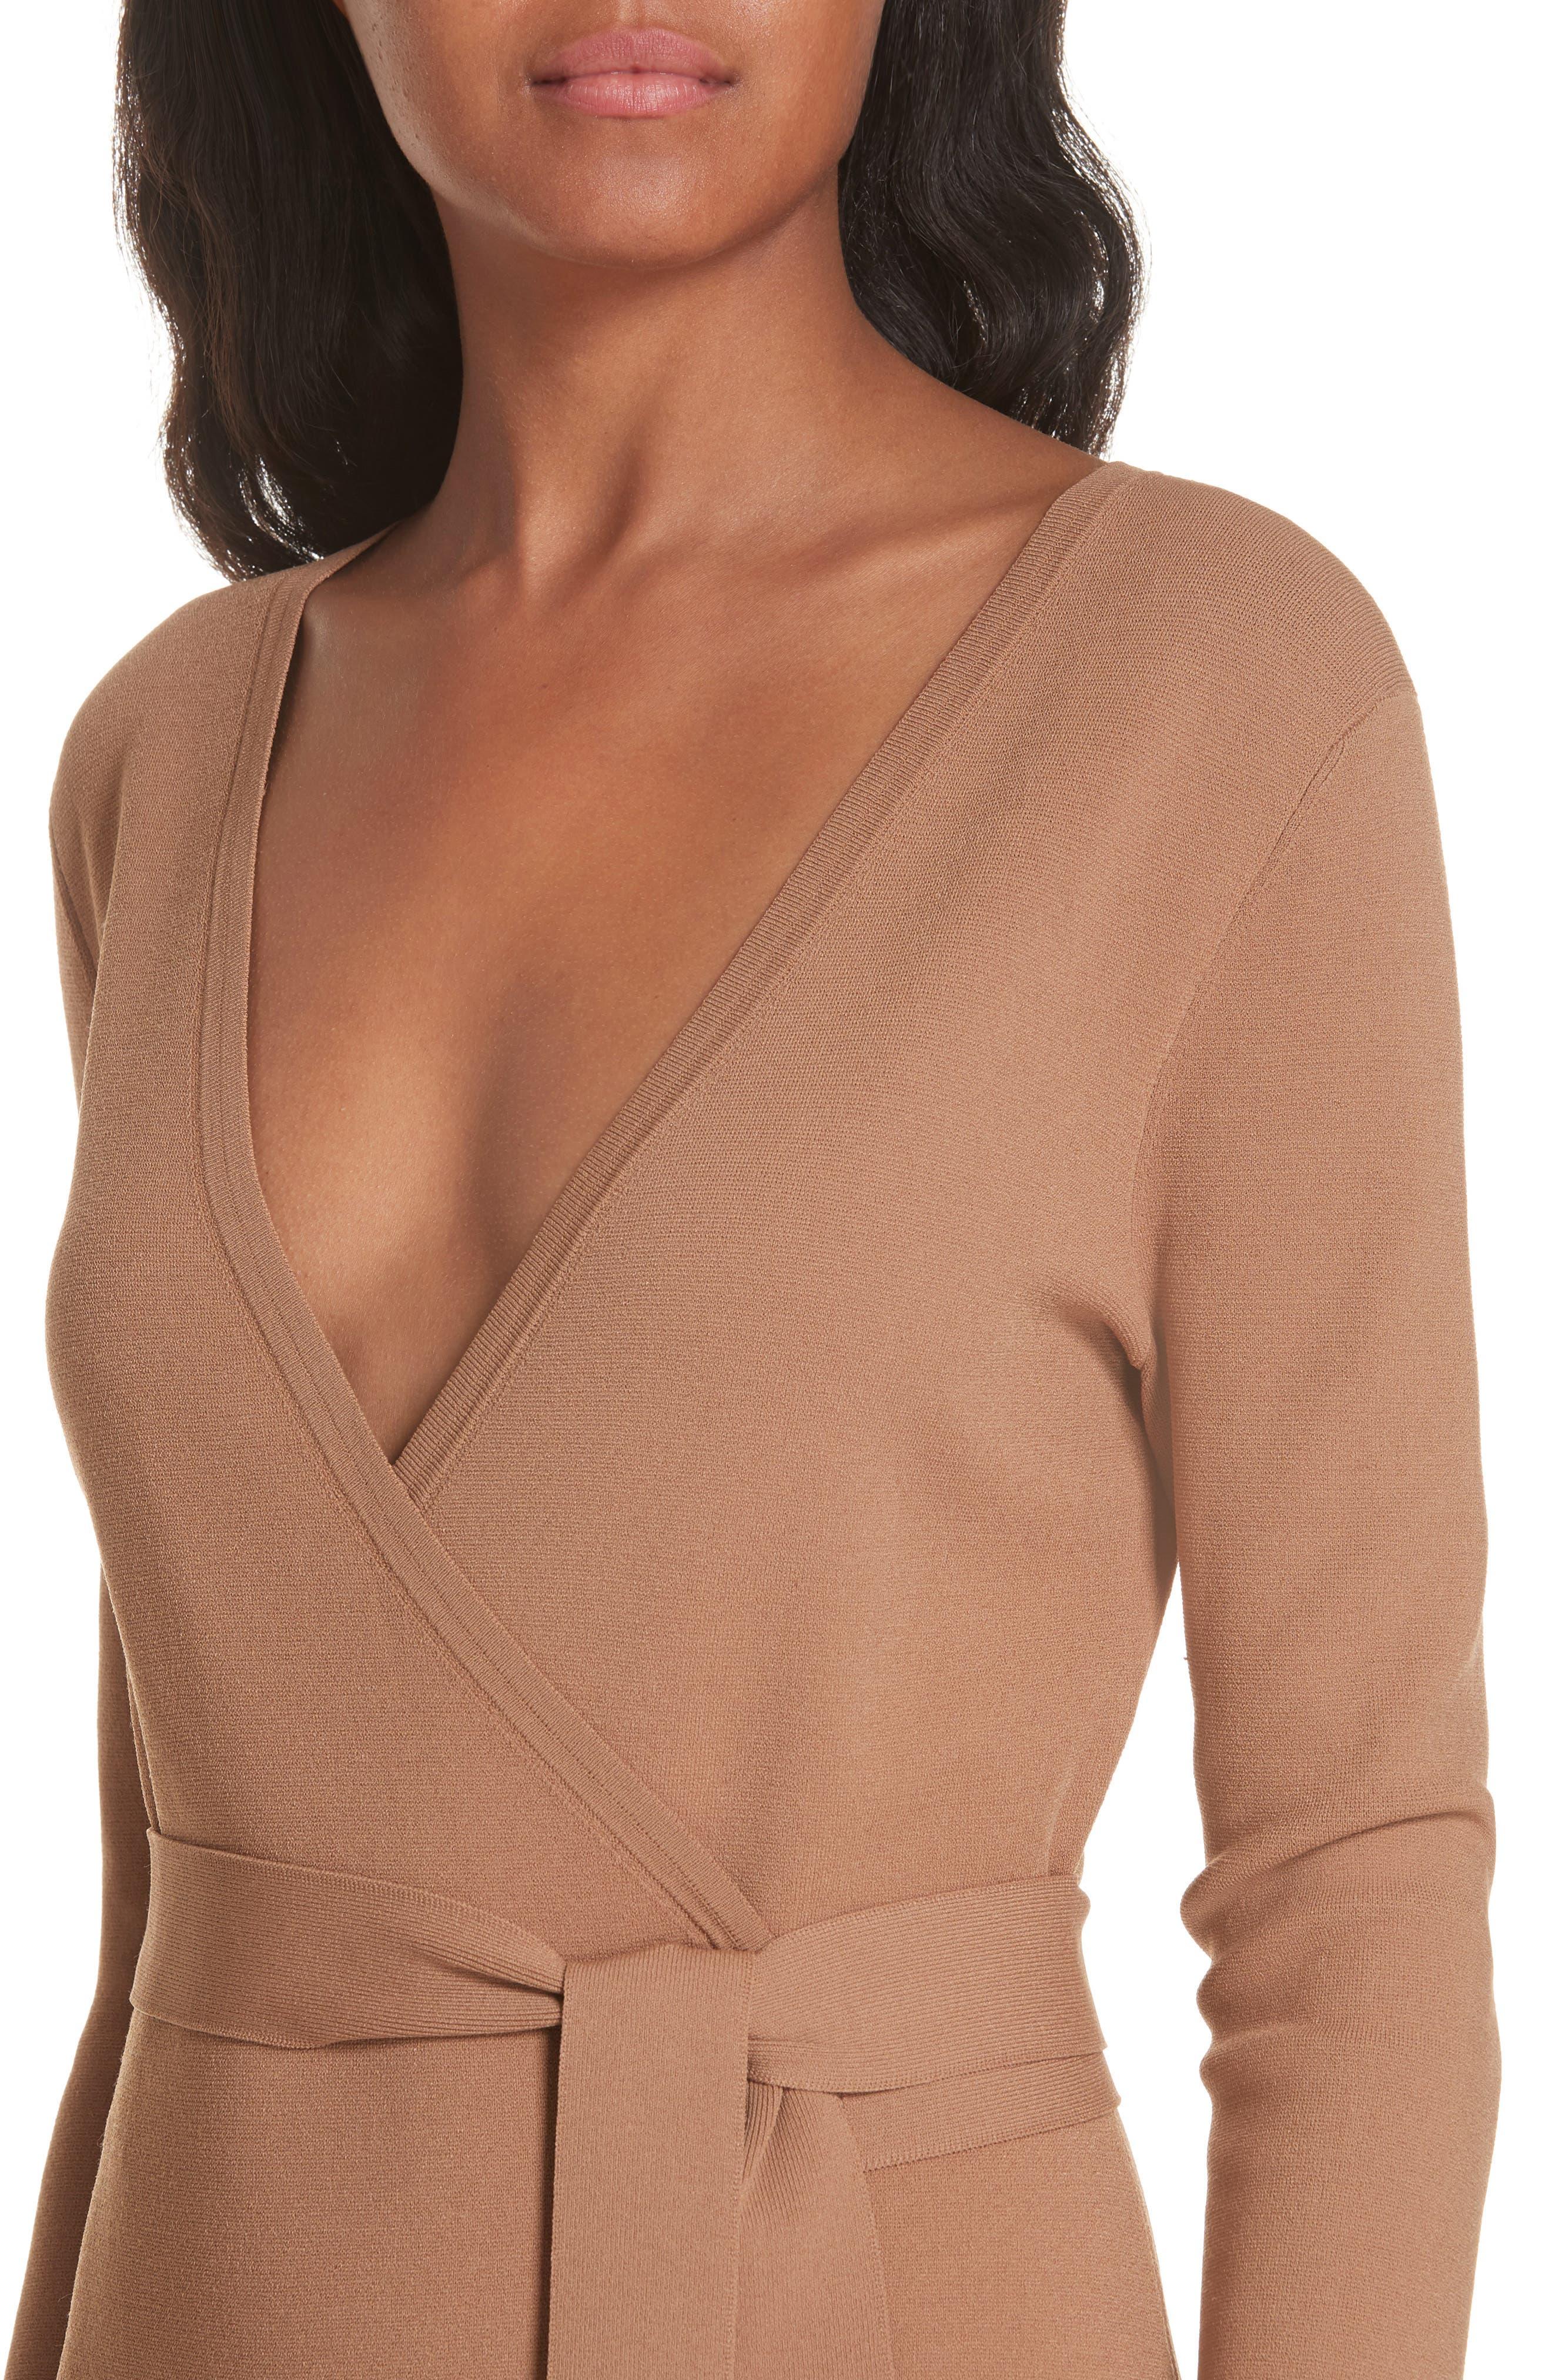 Diane von Furstenberg Knit Wrap Dress,                             Alternate thumbnail 4, color,                             WALNUT